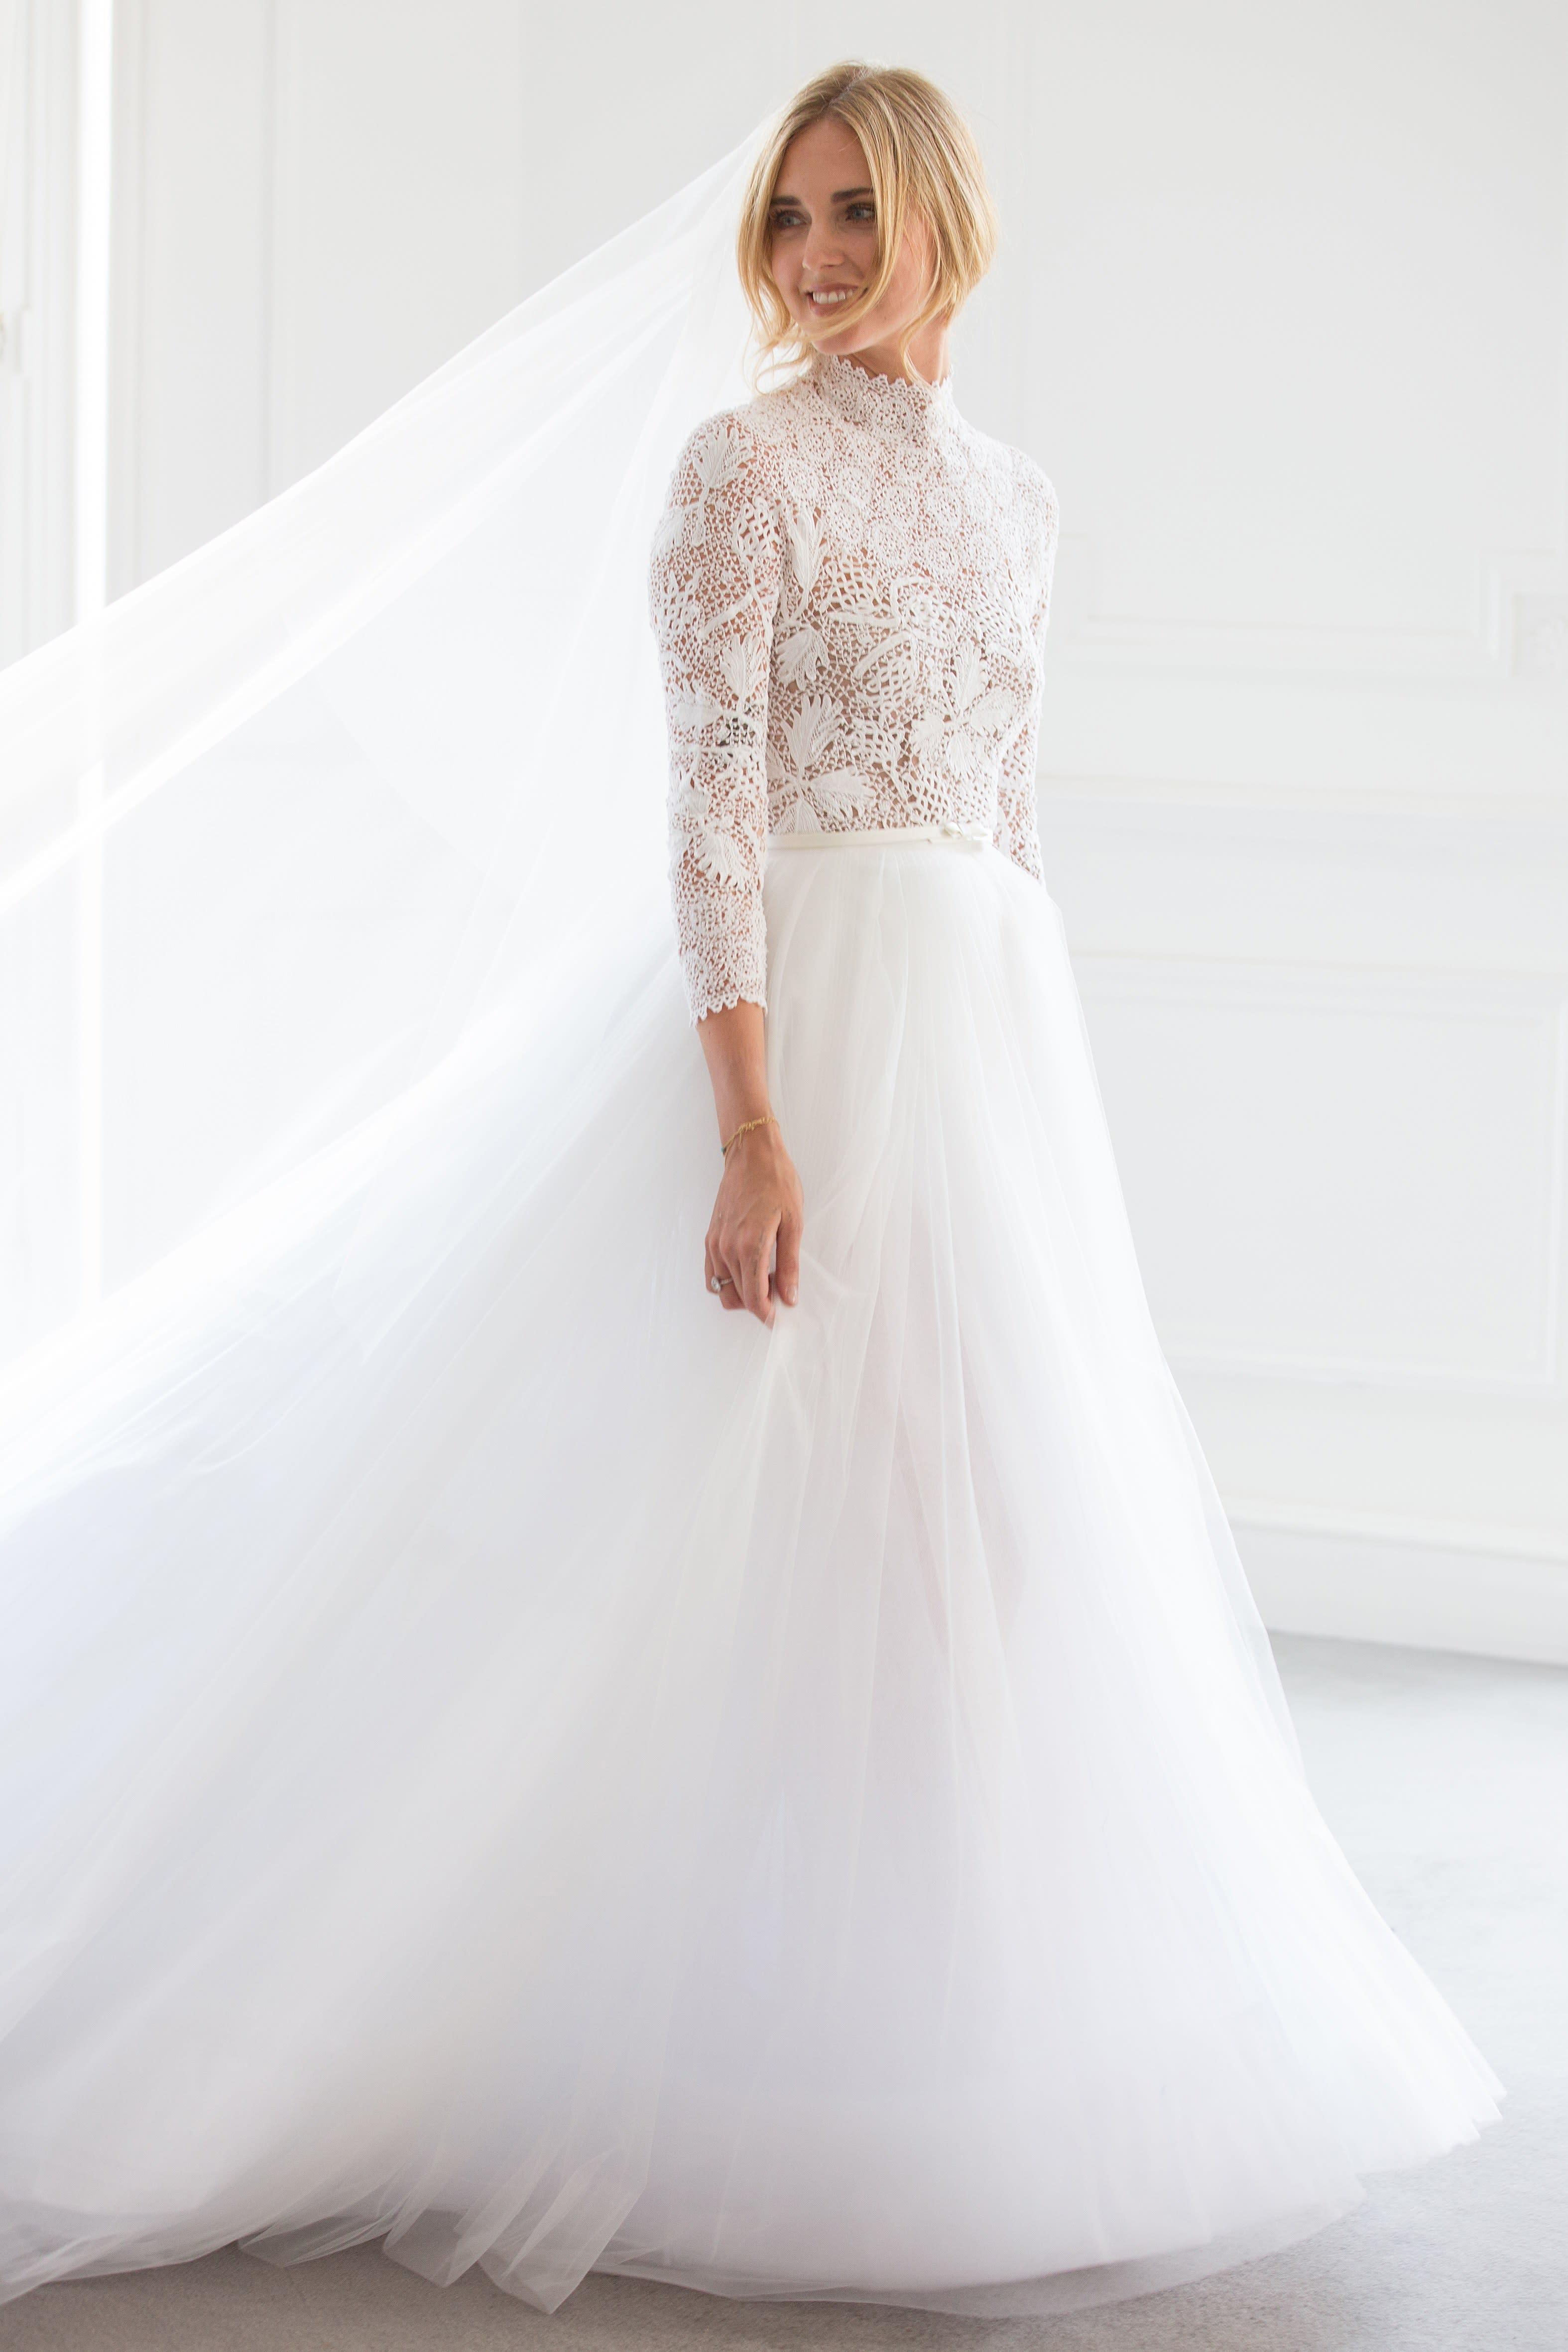 Chiara Ferragni S Wedding Dresses Explained By The Blonde